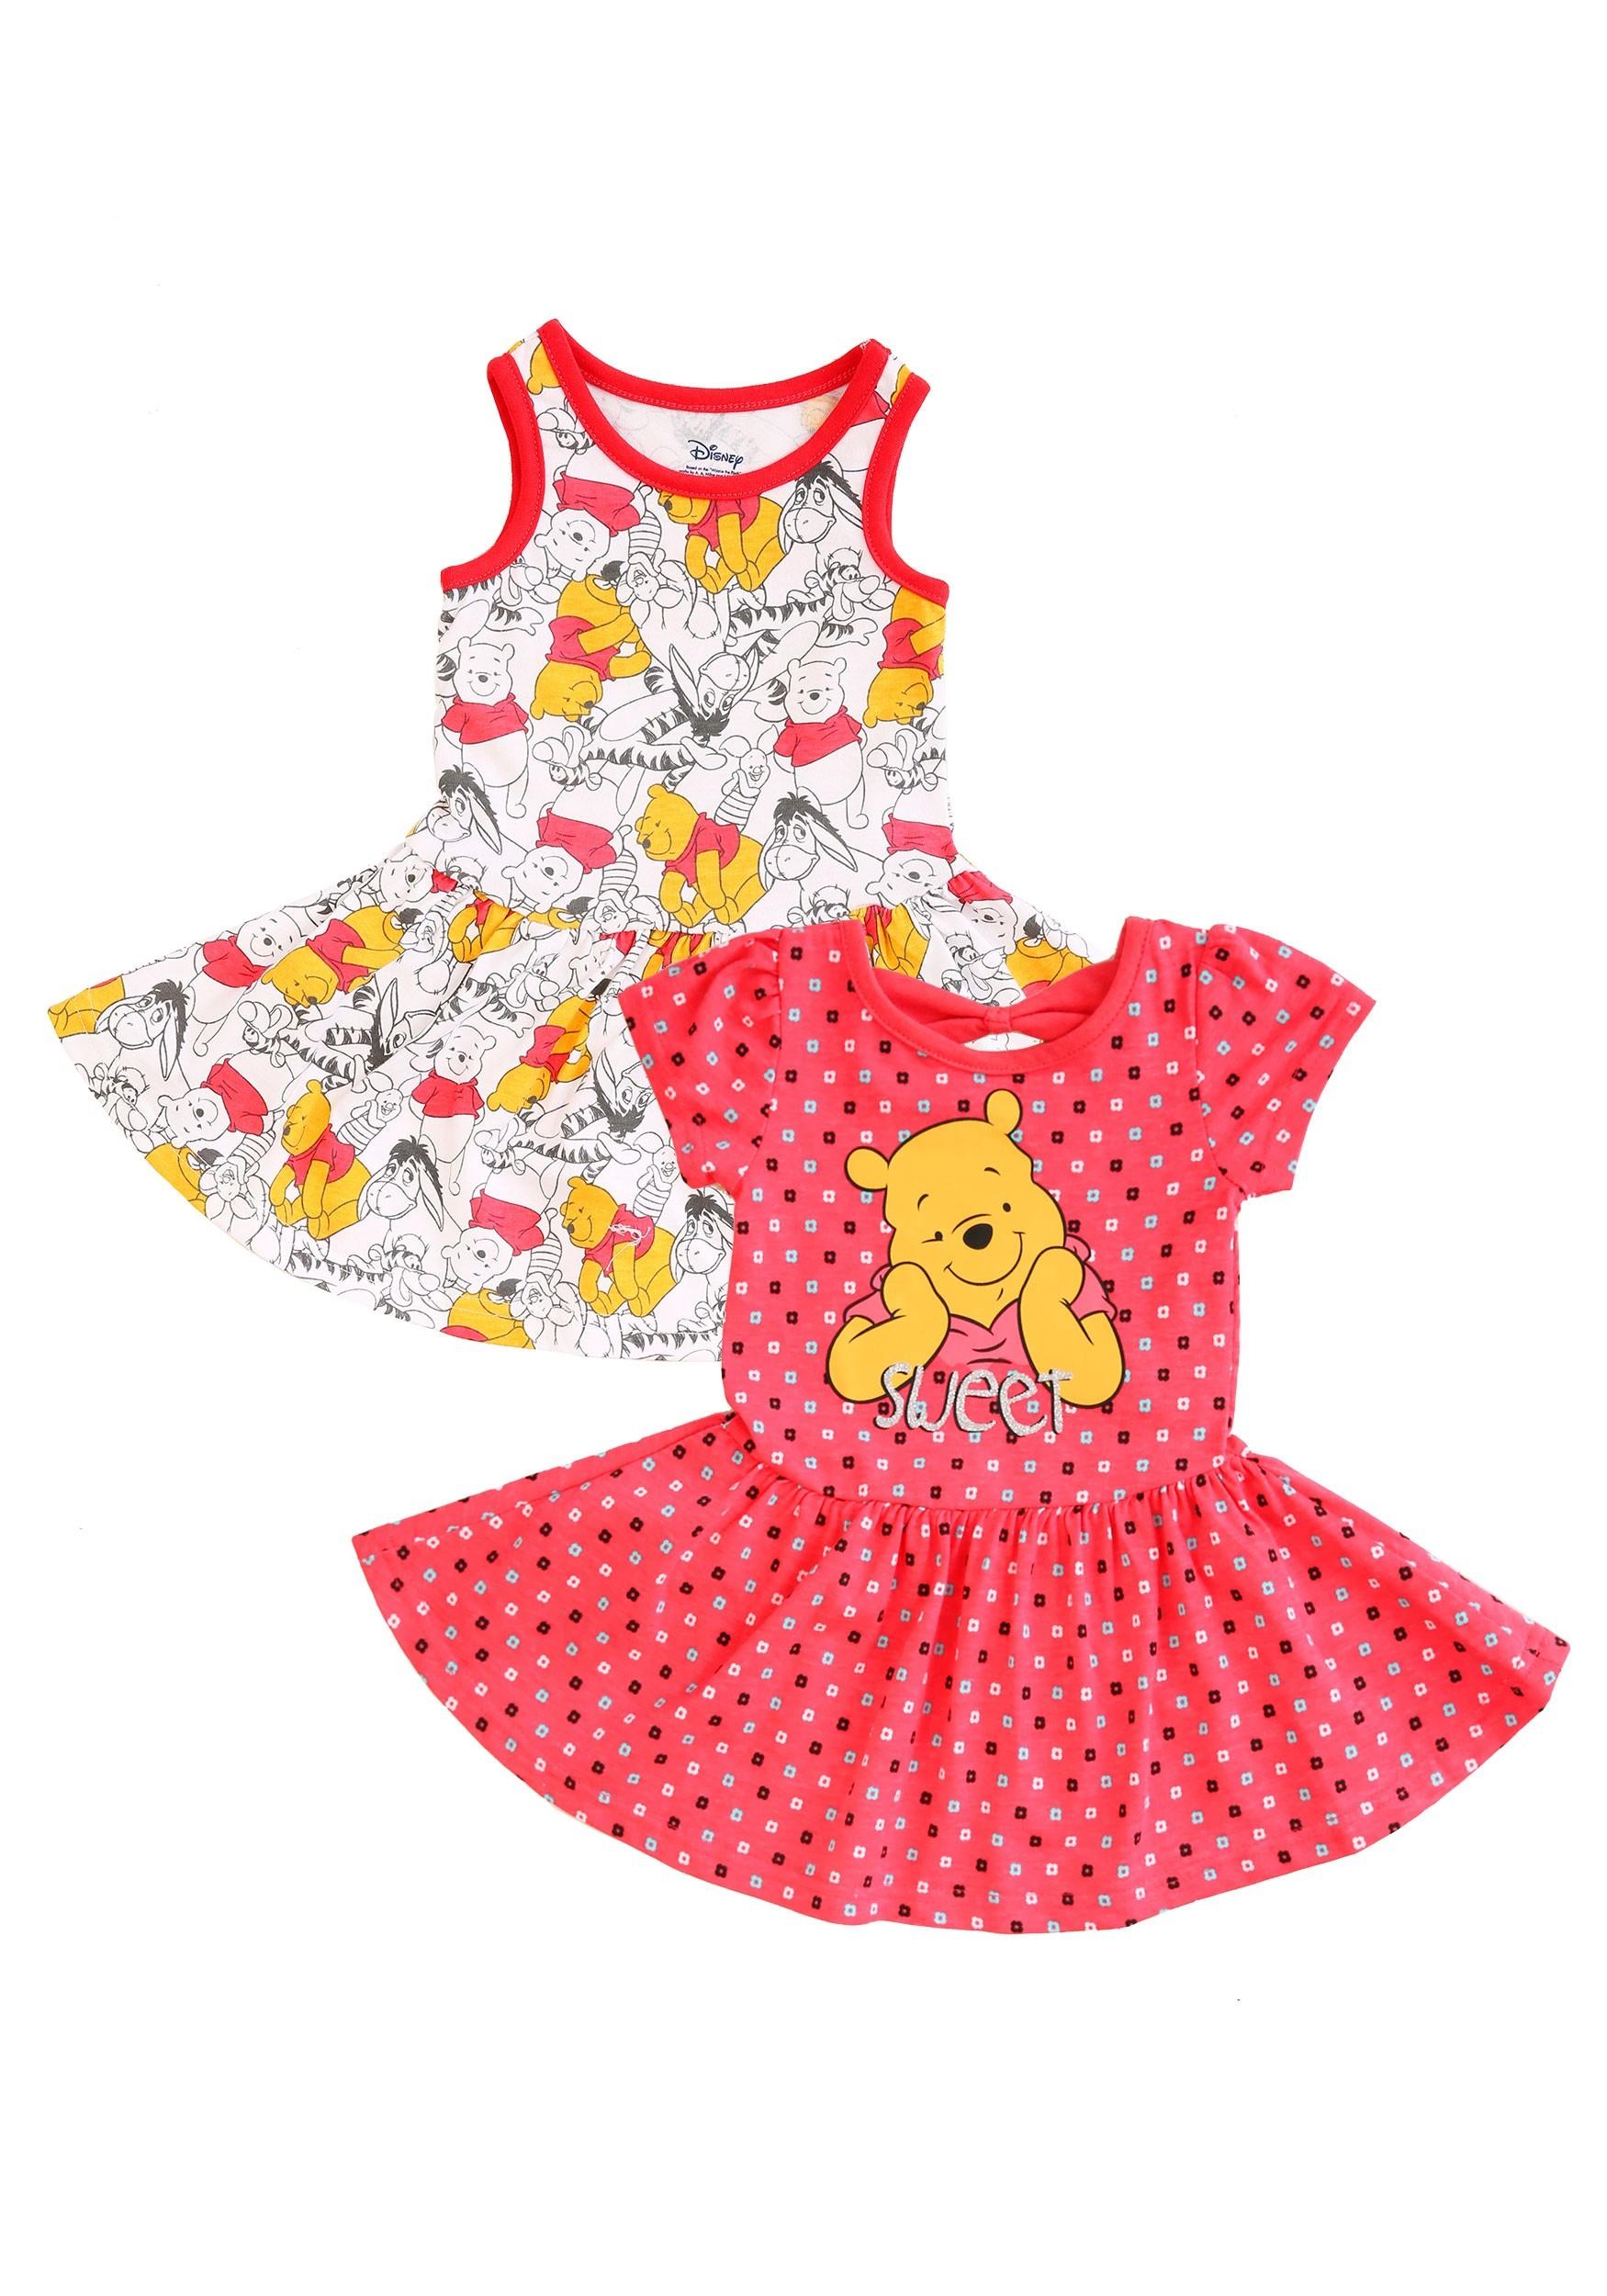 262d4c958073 Winnie the Pooh Dresses 2 Pack flat